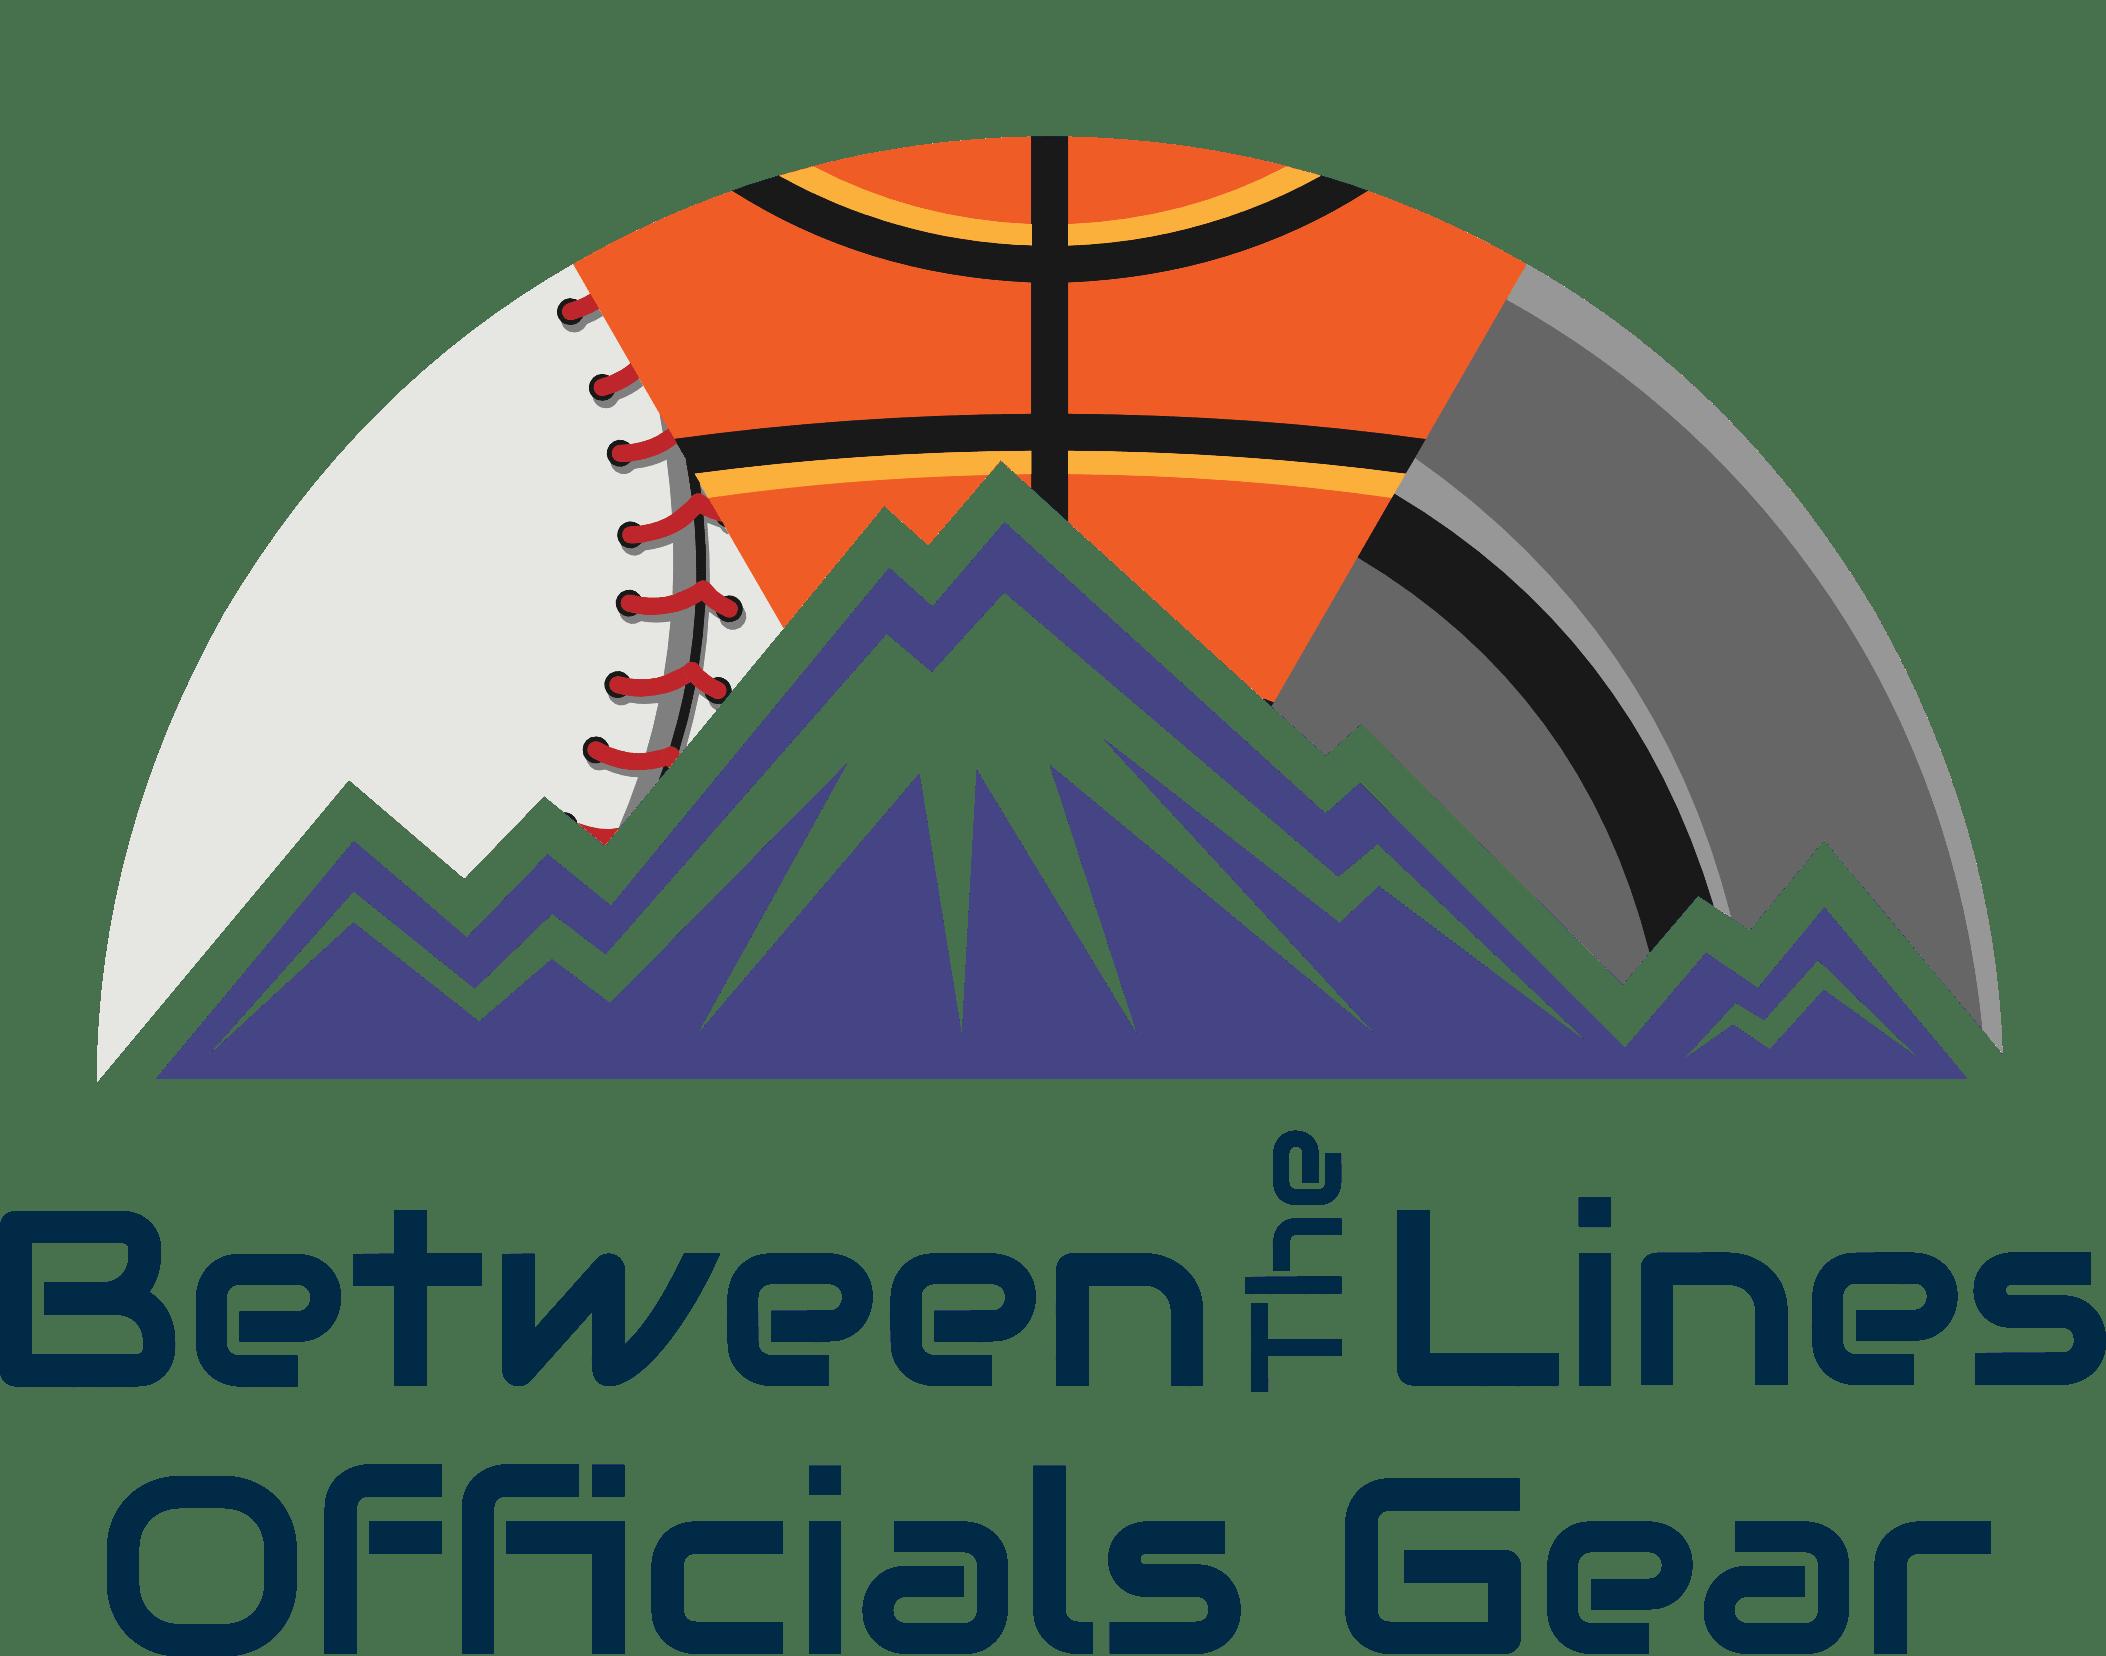 Between The Lines Officials Gear